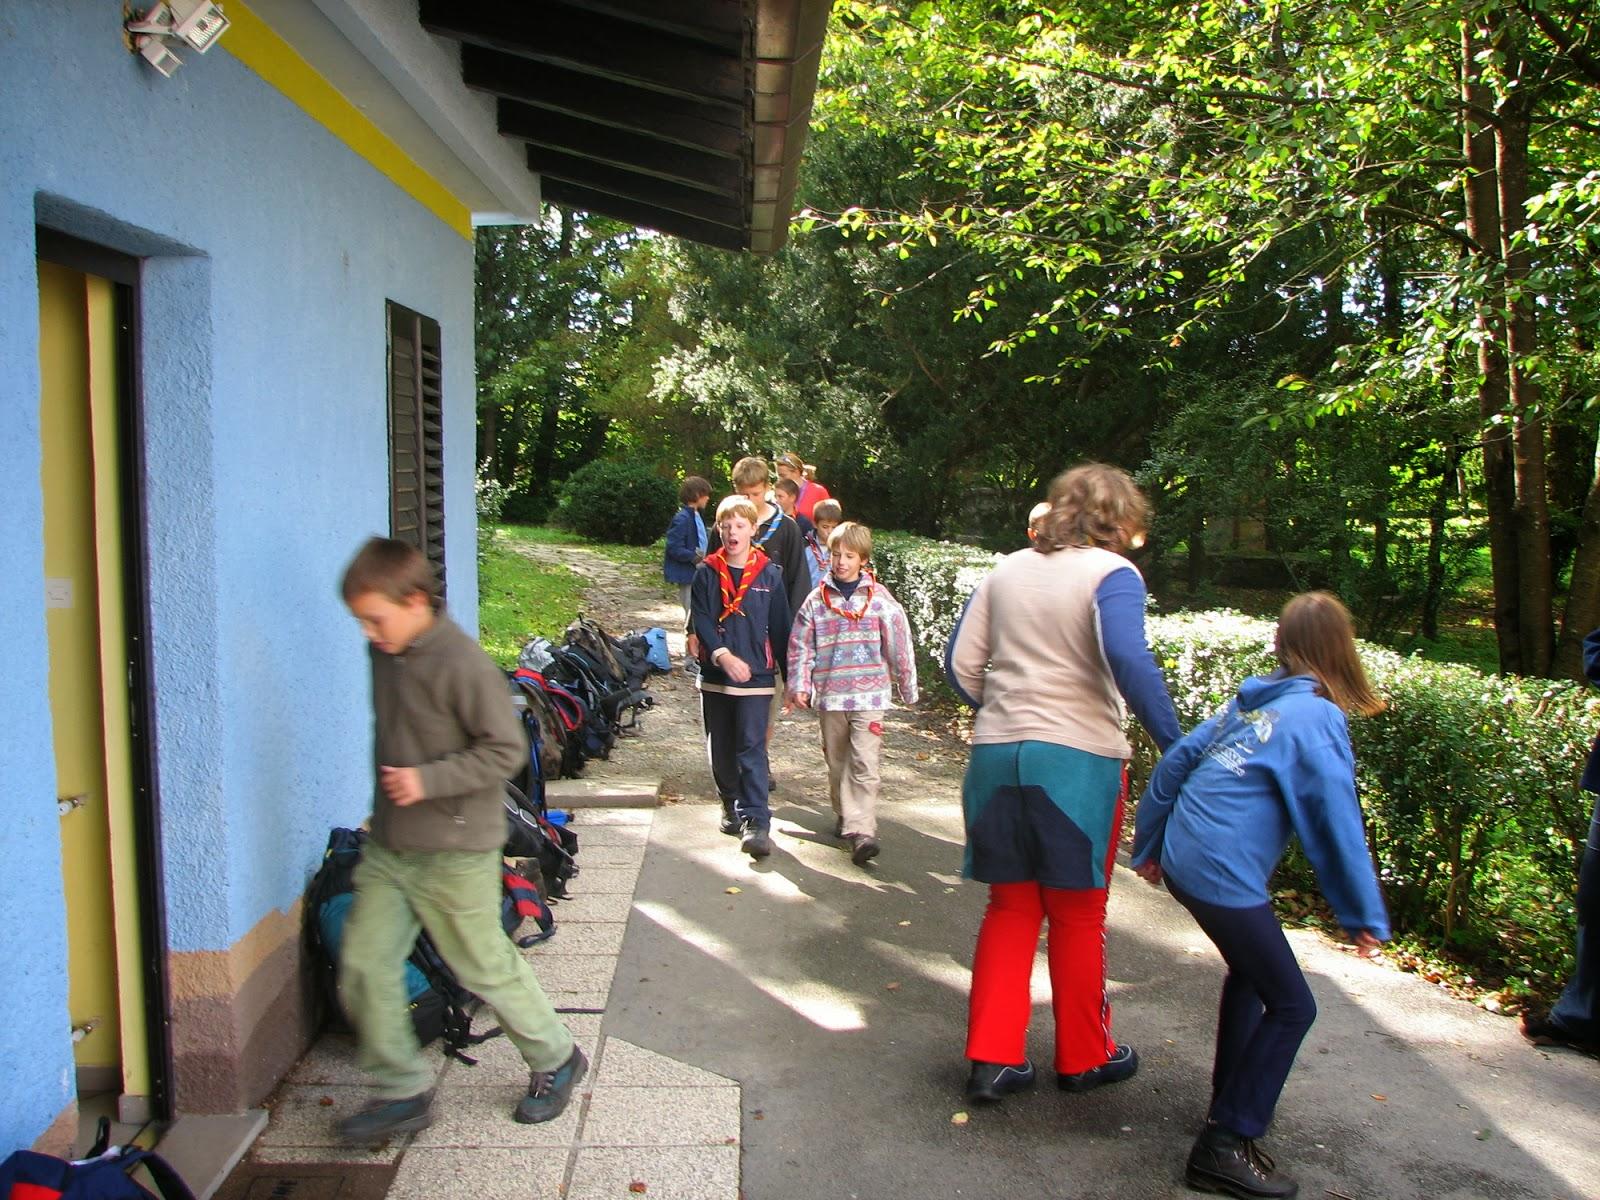 Vodov izlet, Ilirska Bistrica 2005 - Picture%2B011.jpg